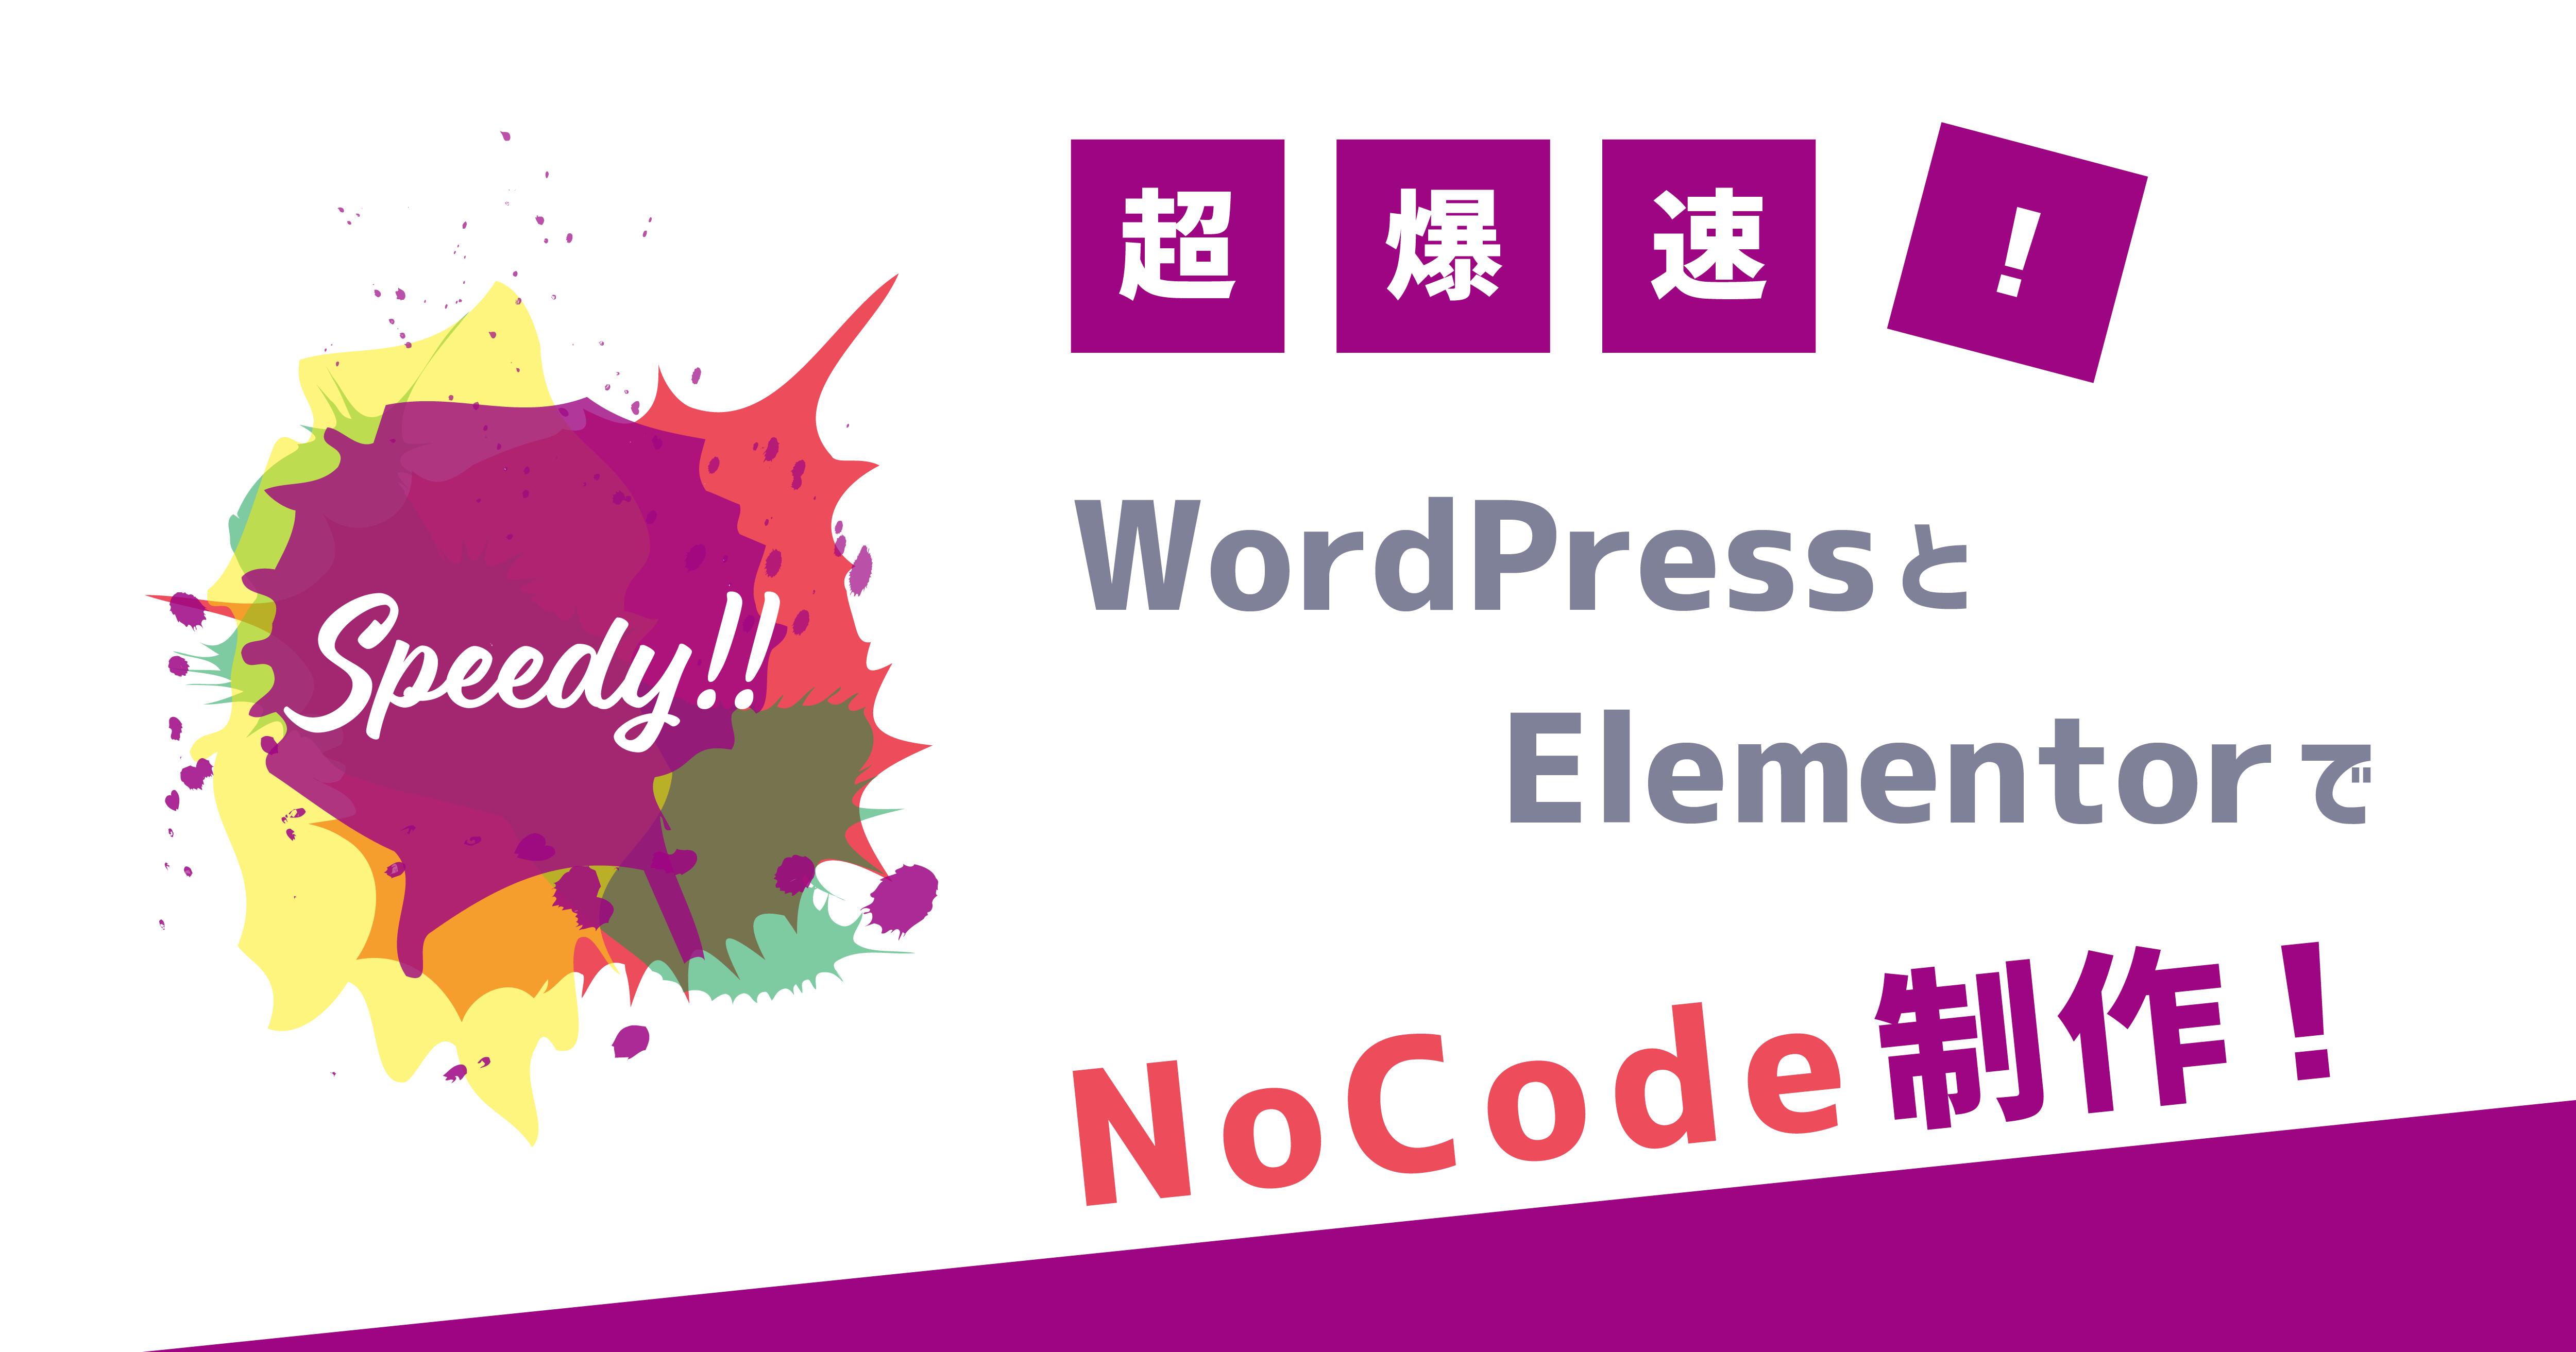 WordPressとElementorでNoCode制作!